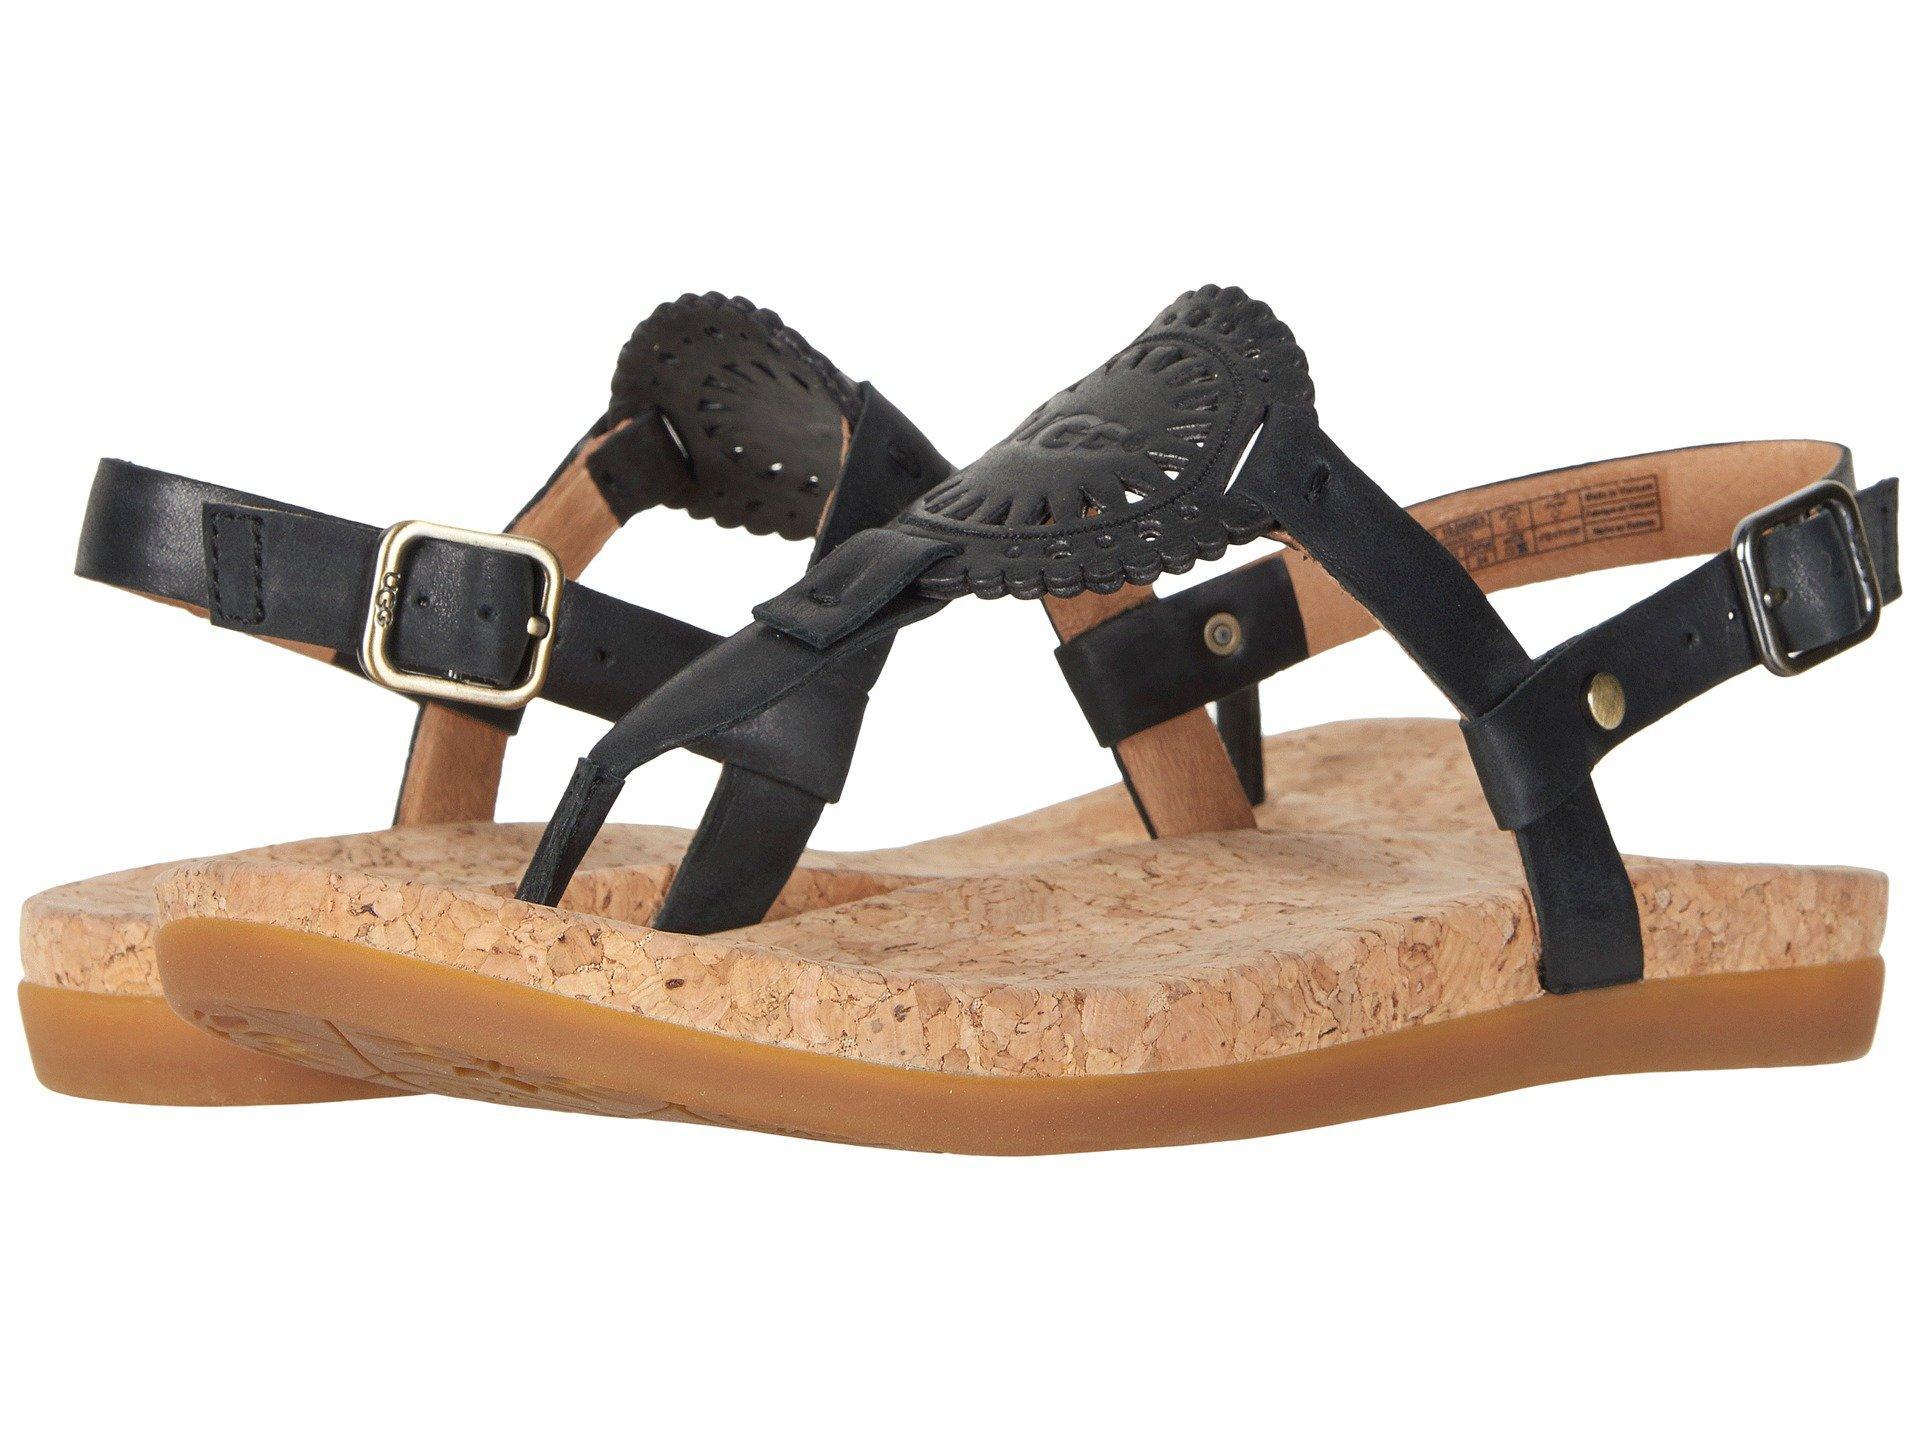 a98cd657e8b0 Lyst - UGG Ayden Ii (gold) Women s Sandals in Black